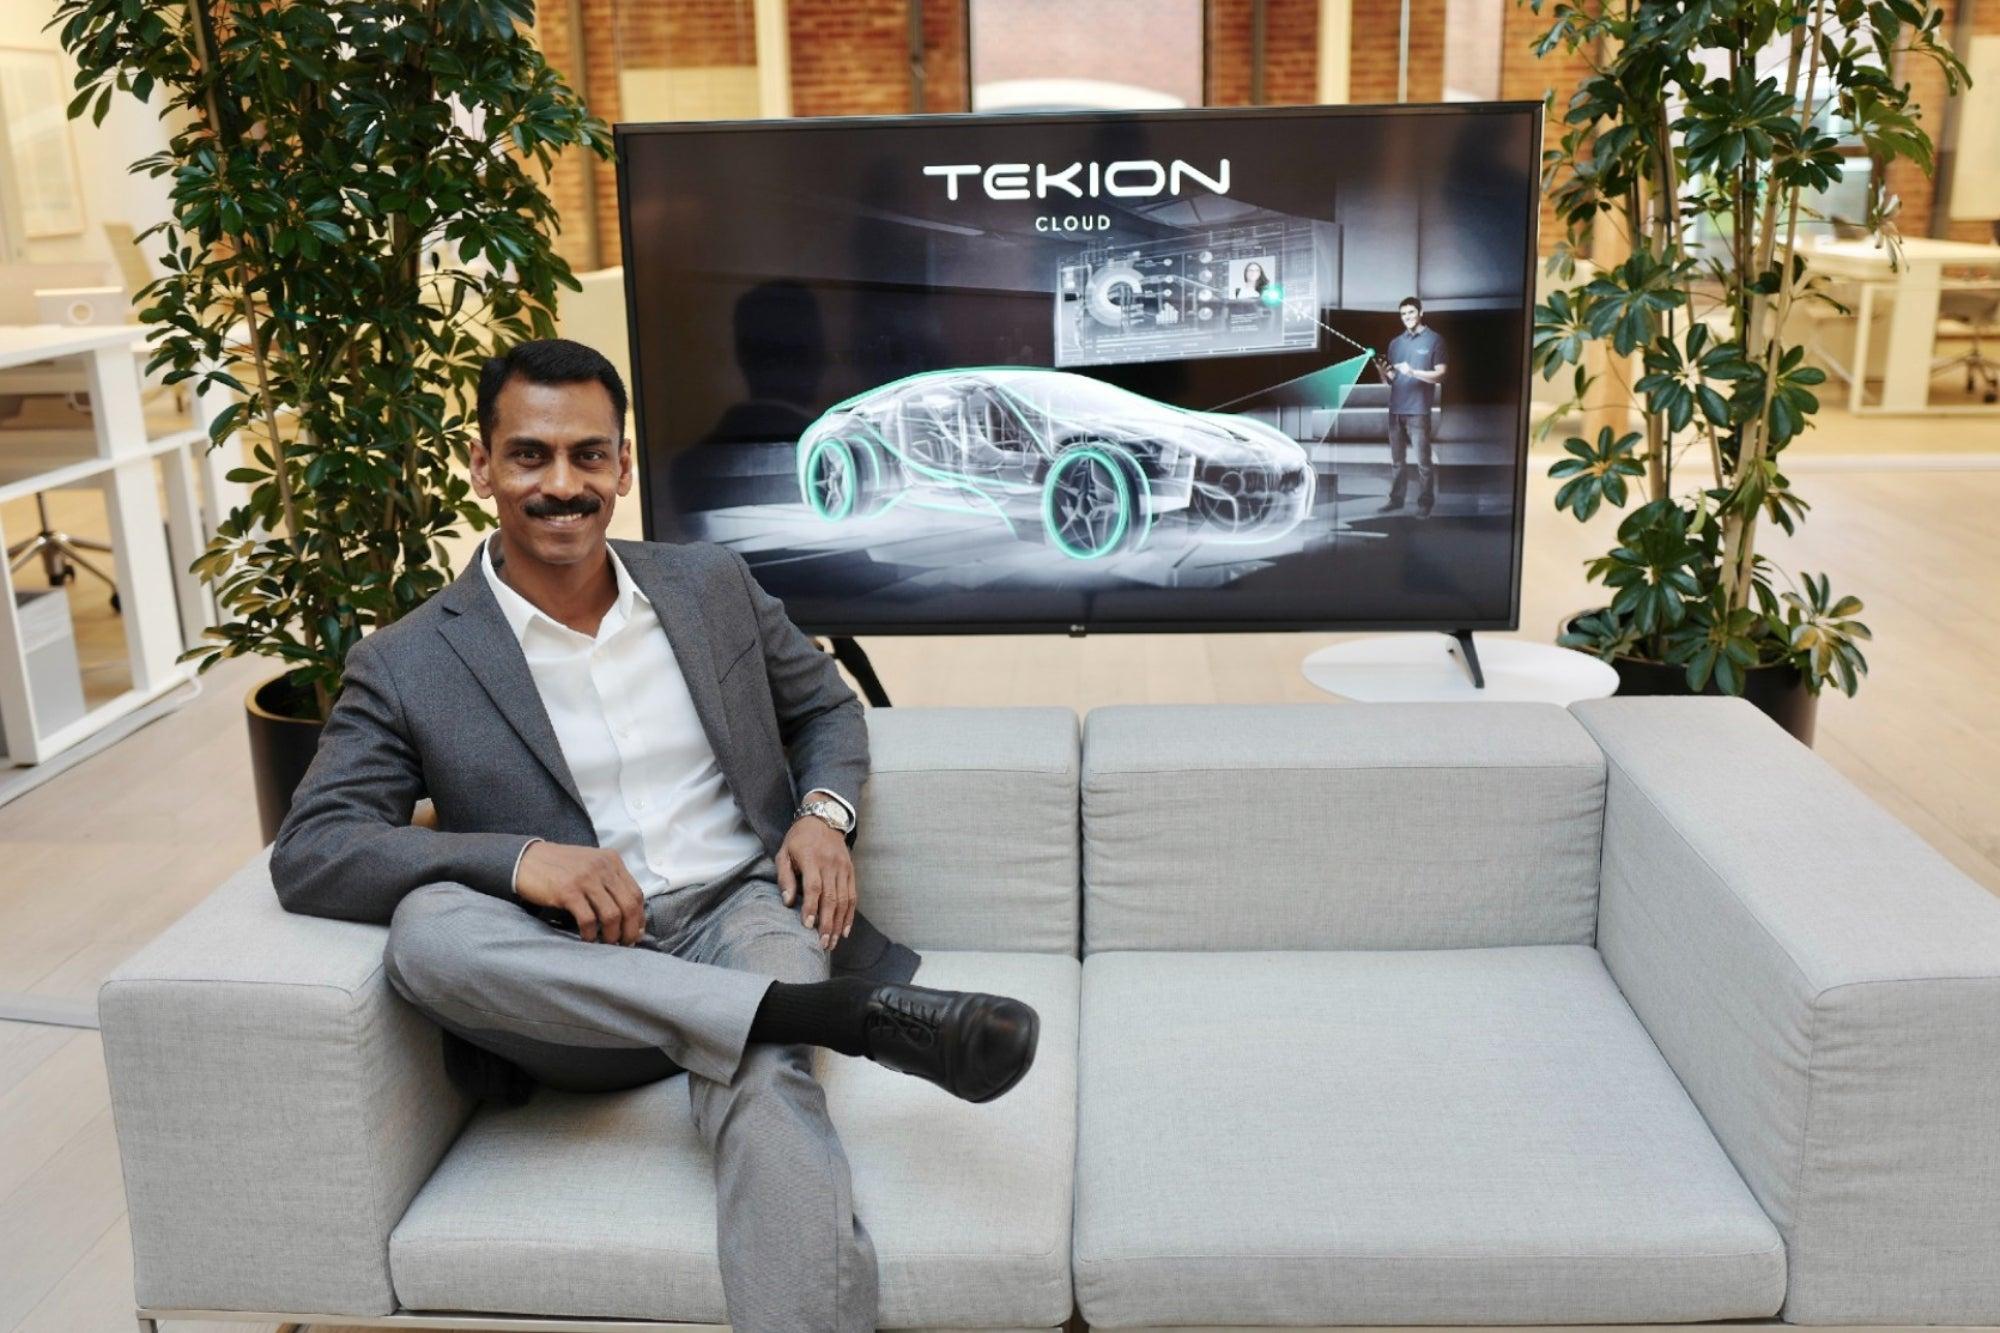 Jay Vijayan, CEO and Founder of Tekion